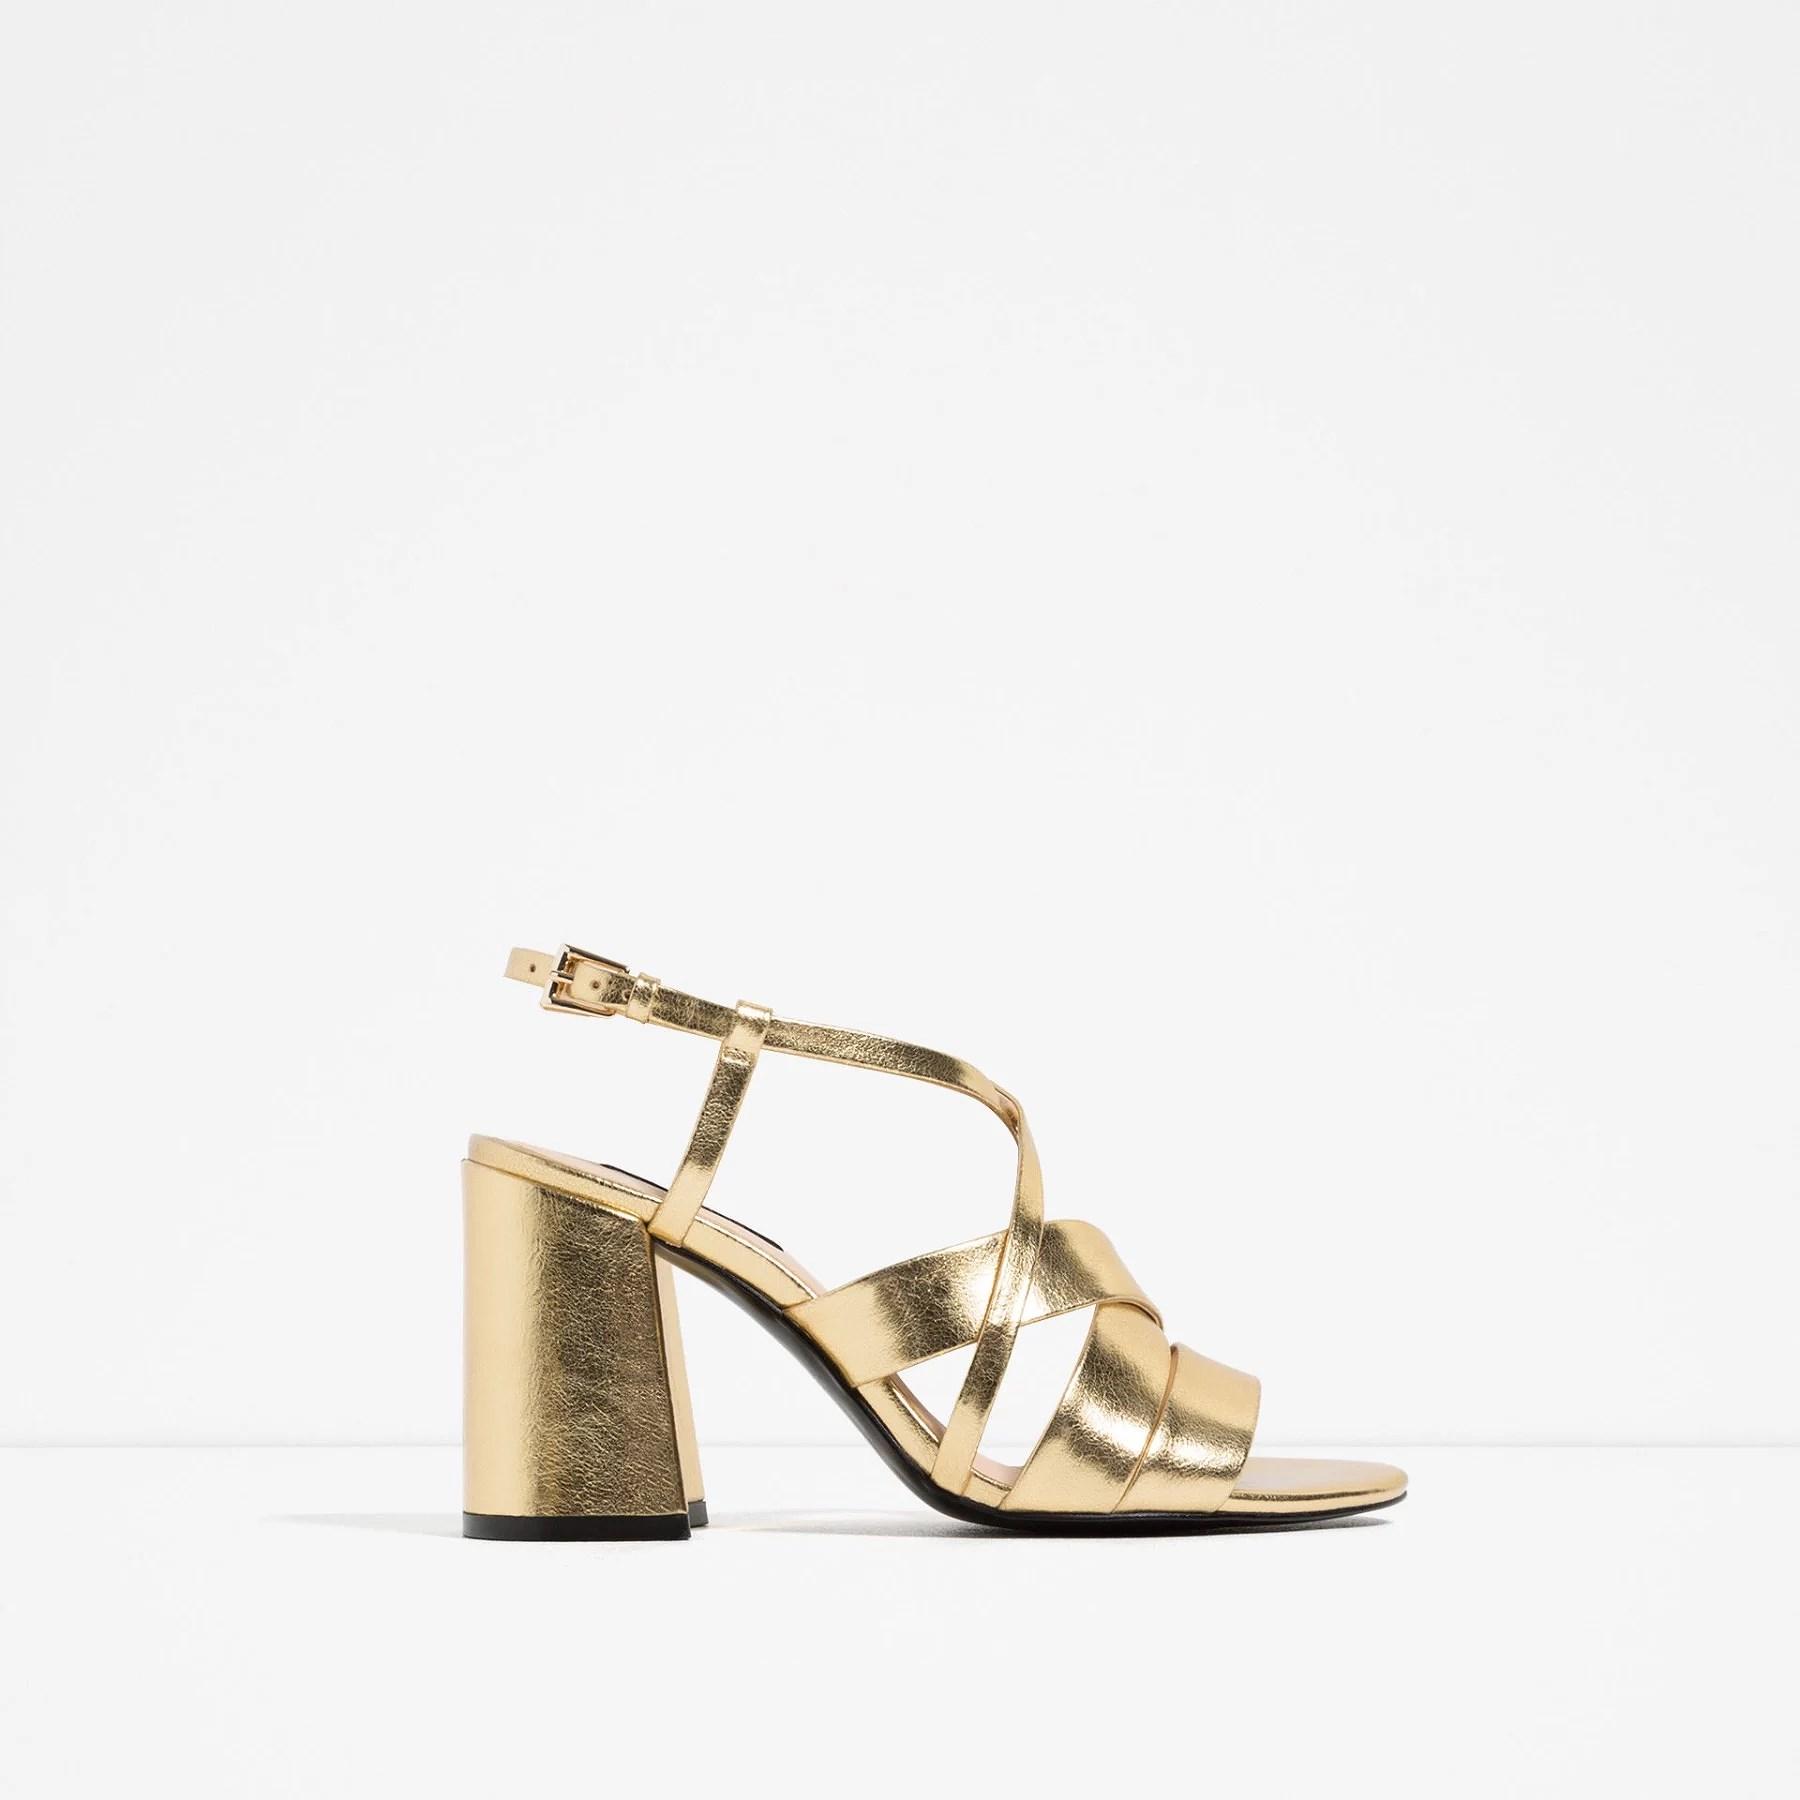 Shoe Obsessing